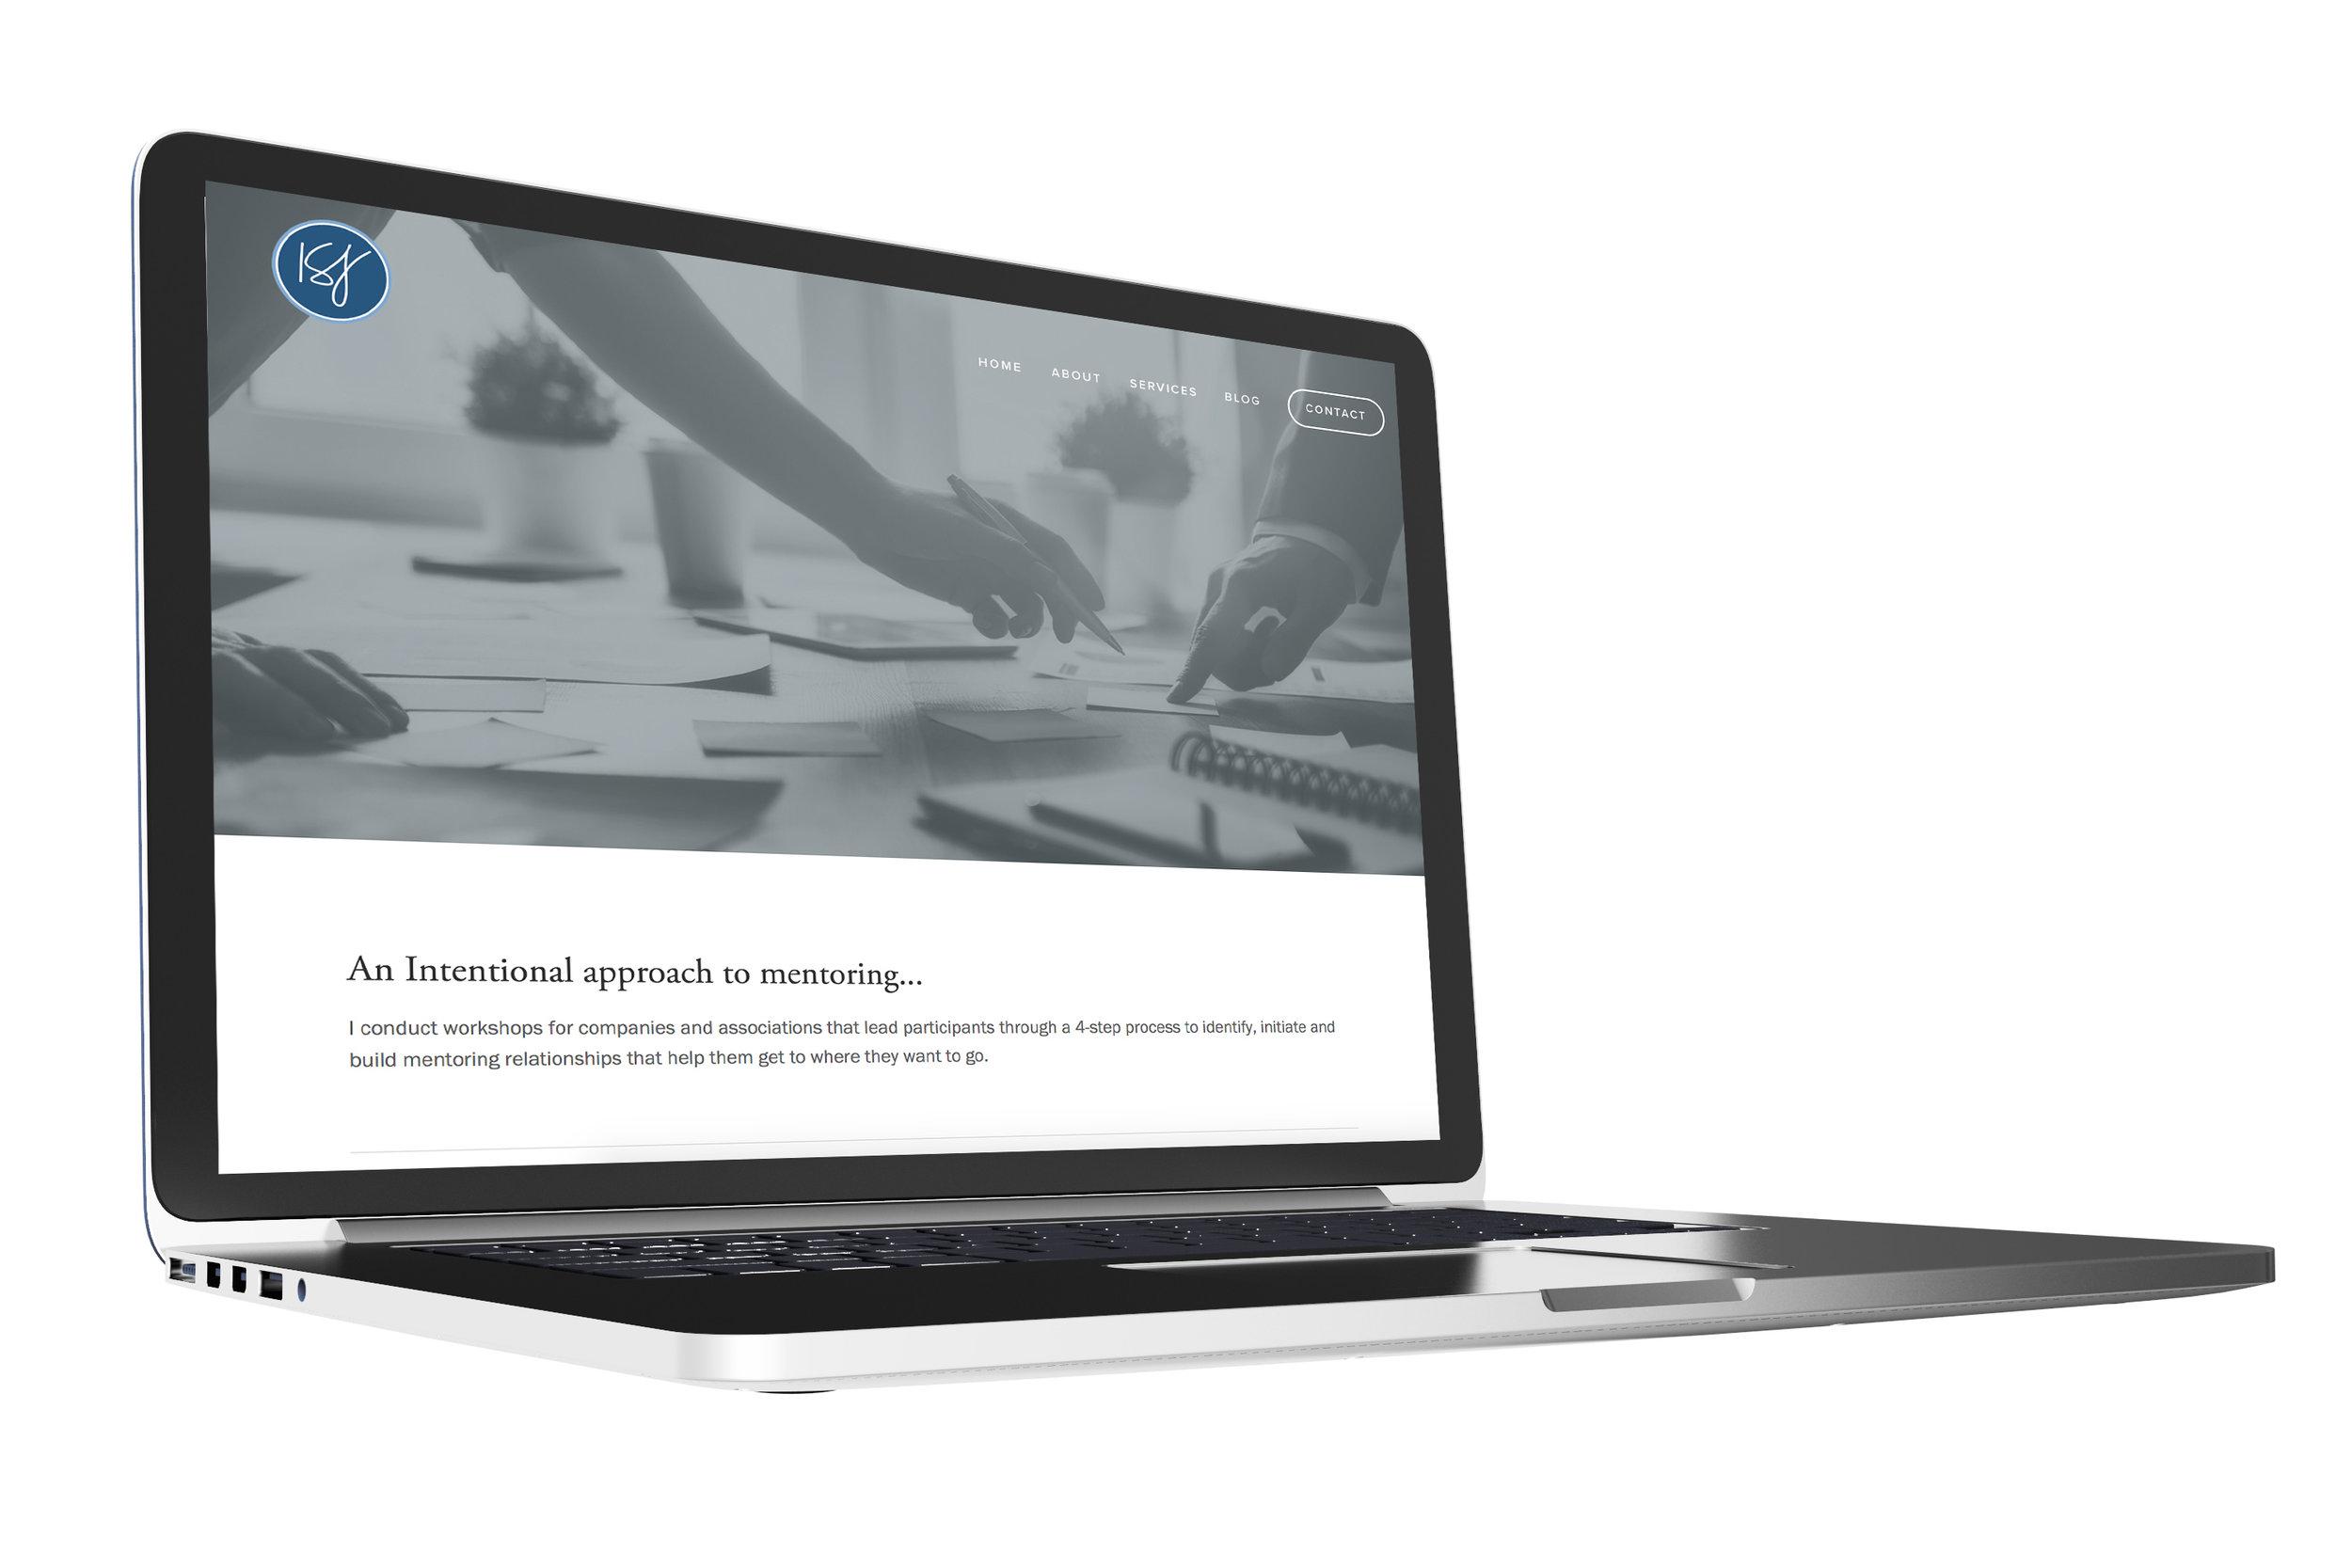 kathy-jo-van-strategy-driven-marketing-content-blogging-website-design-search-engine-optimization-seo.jpg